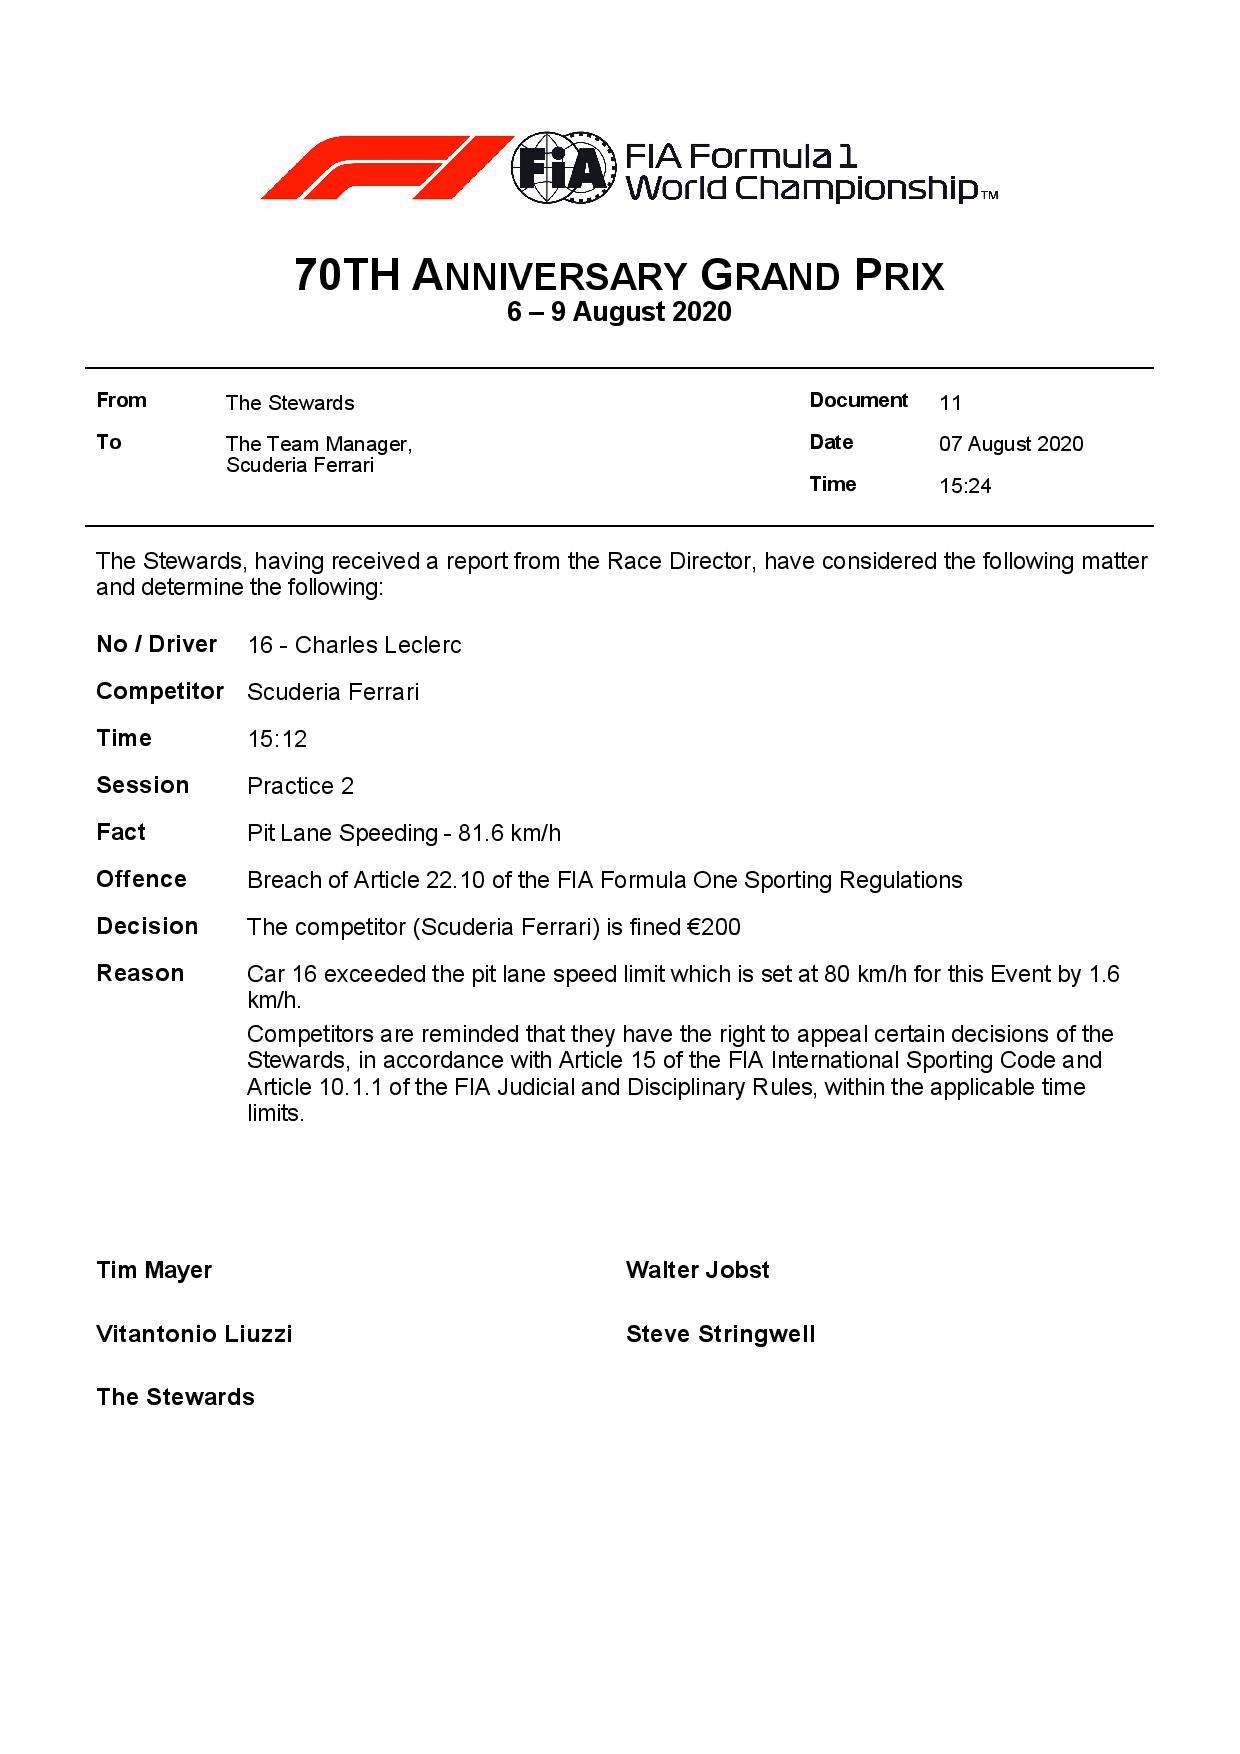 Officiel : La Scuderia Ferrari écope d'une amende à Silverstone 2